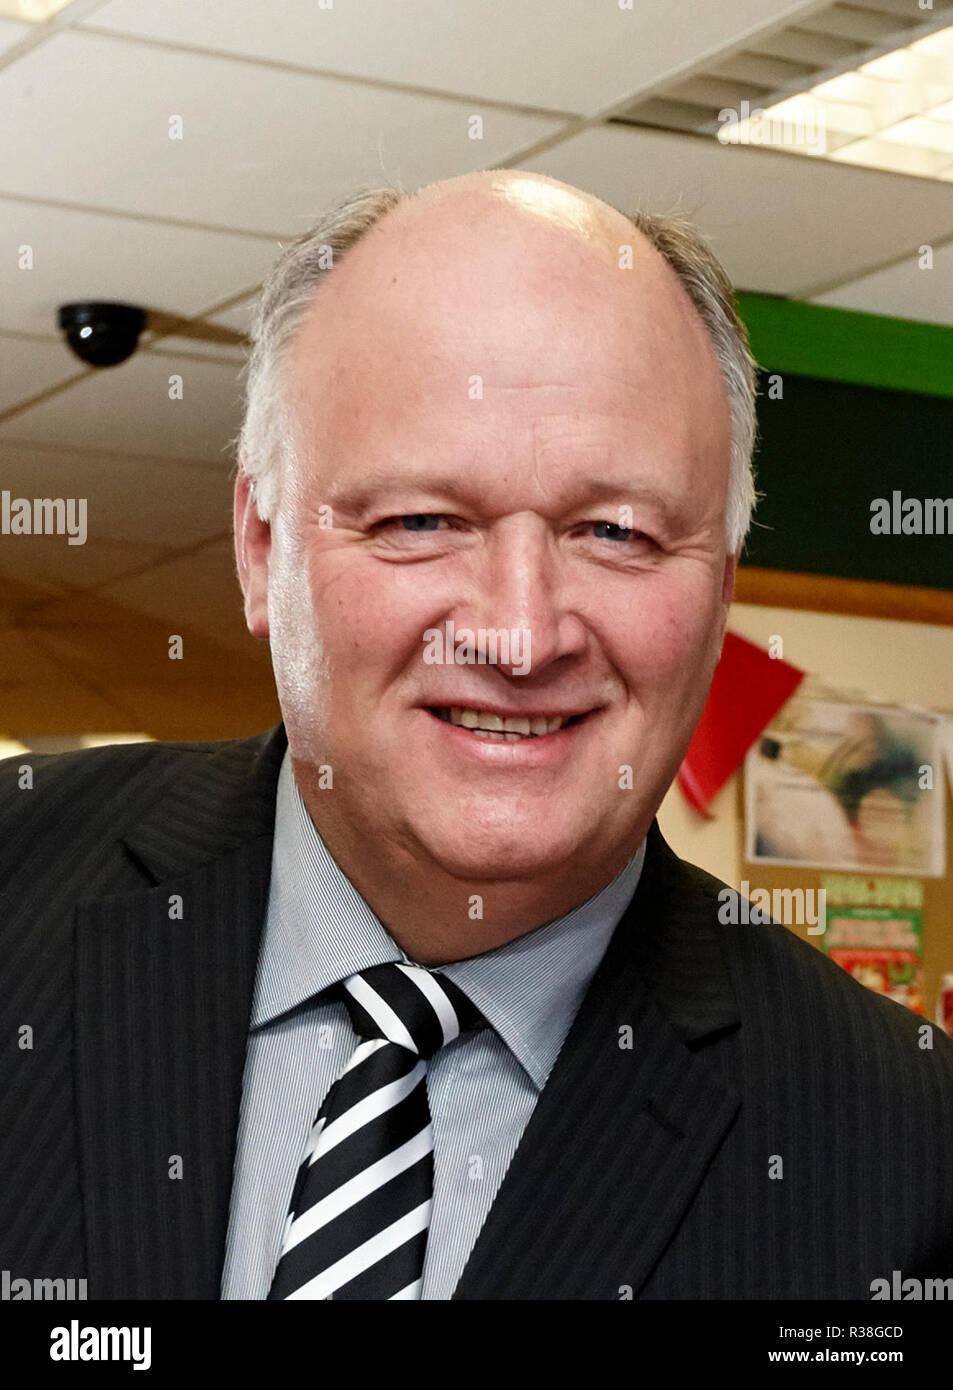 David Simpson MP Northern Ireland DUP politician - Stock Image